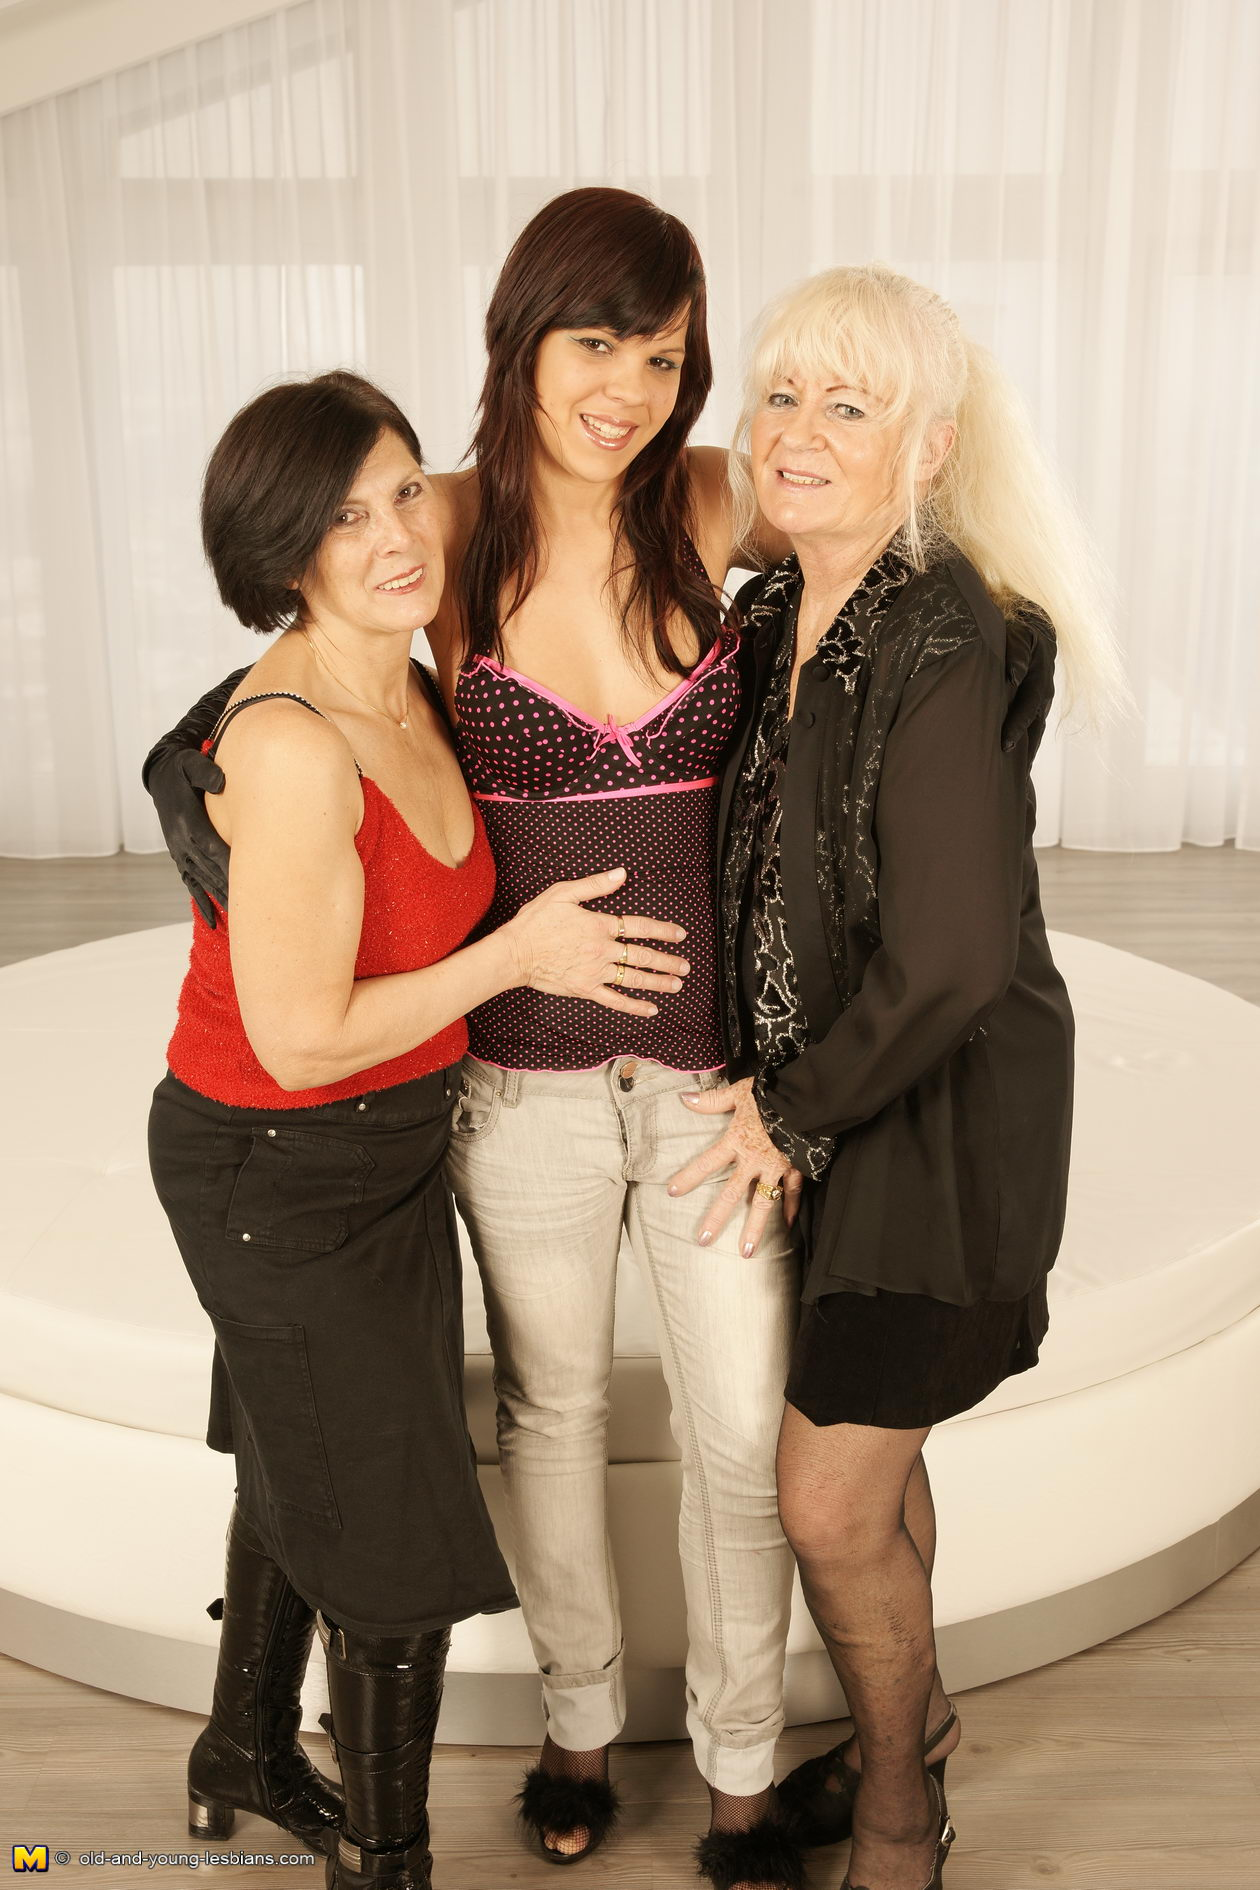 Lesbian Hotties